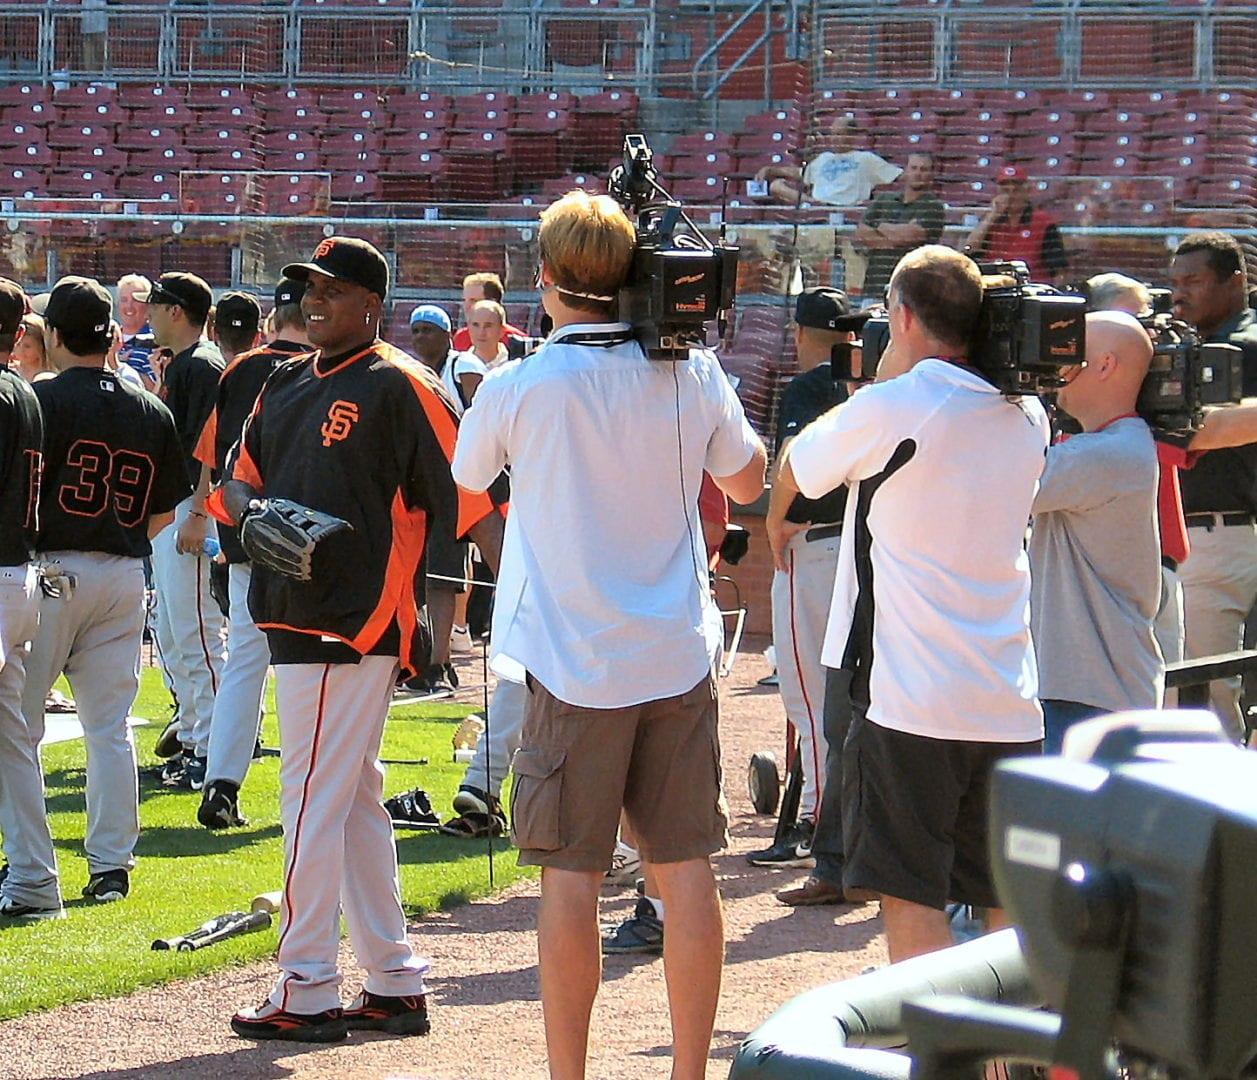 Cameramen broadcast the baseball game